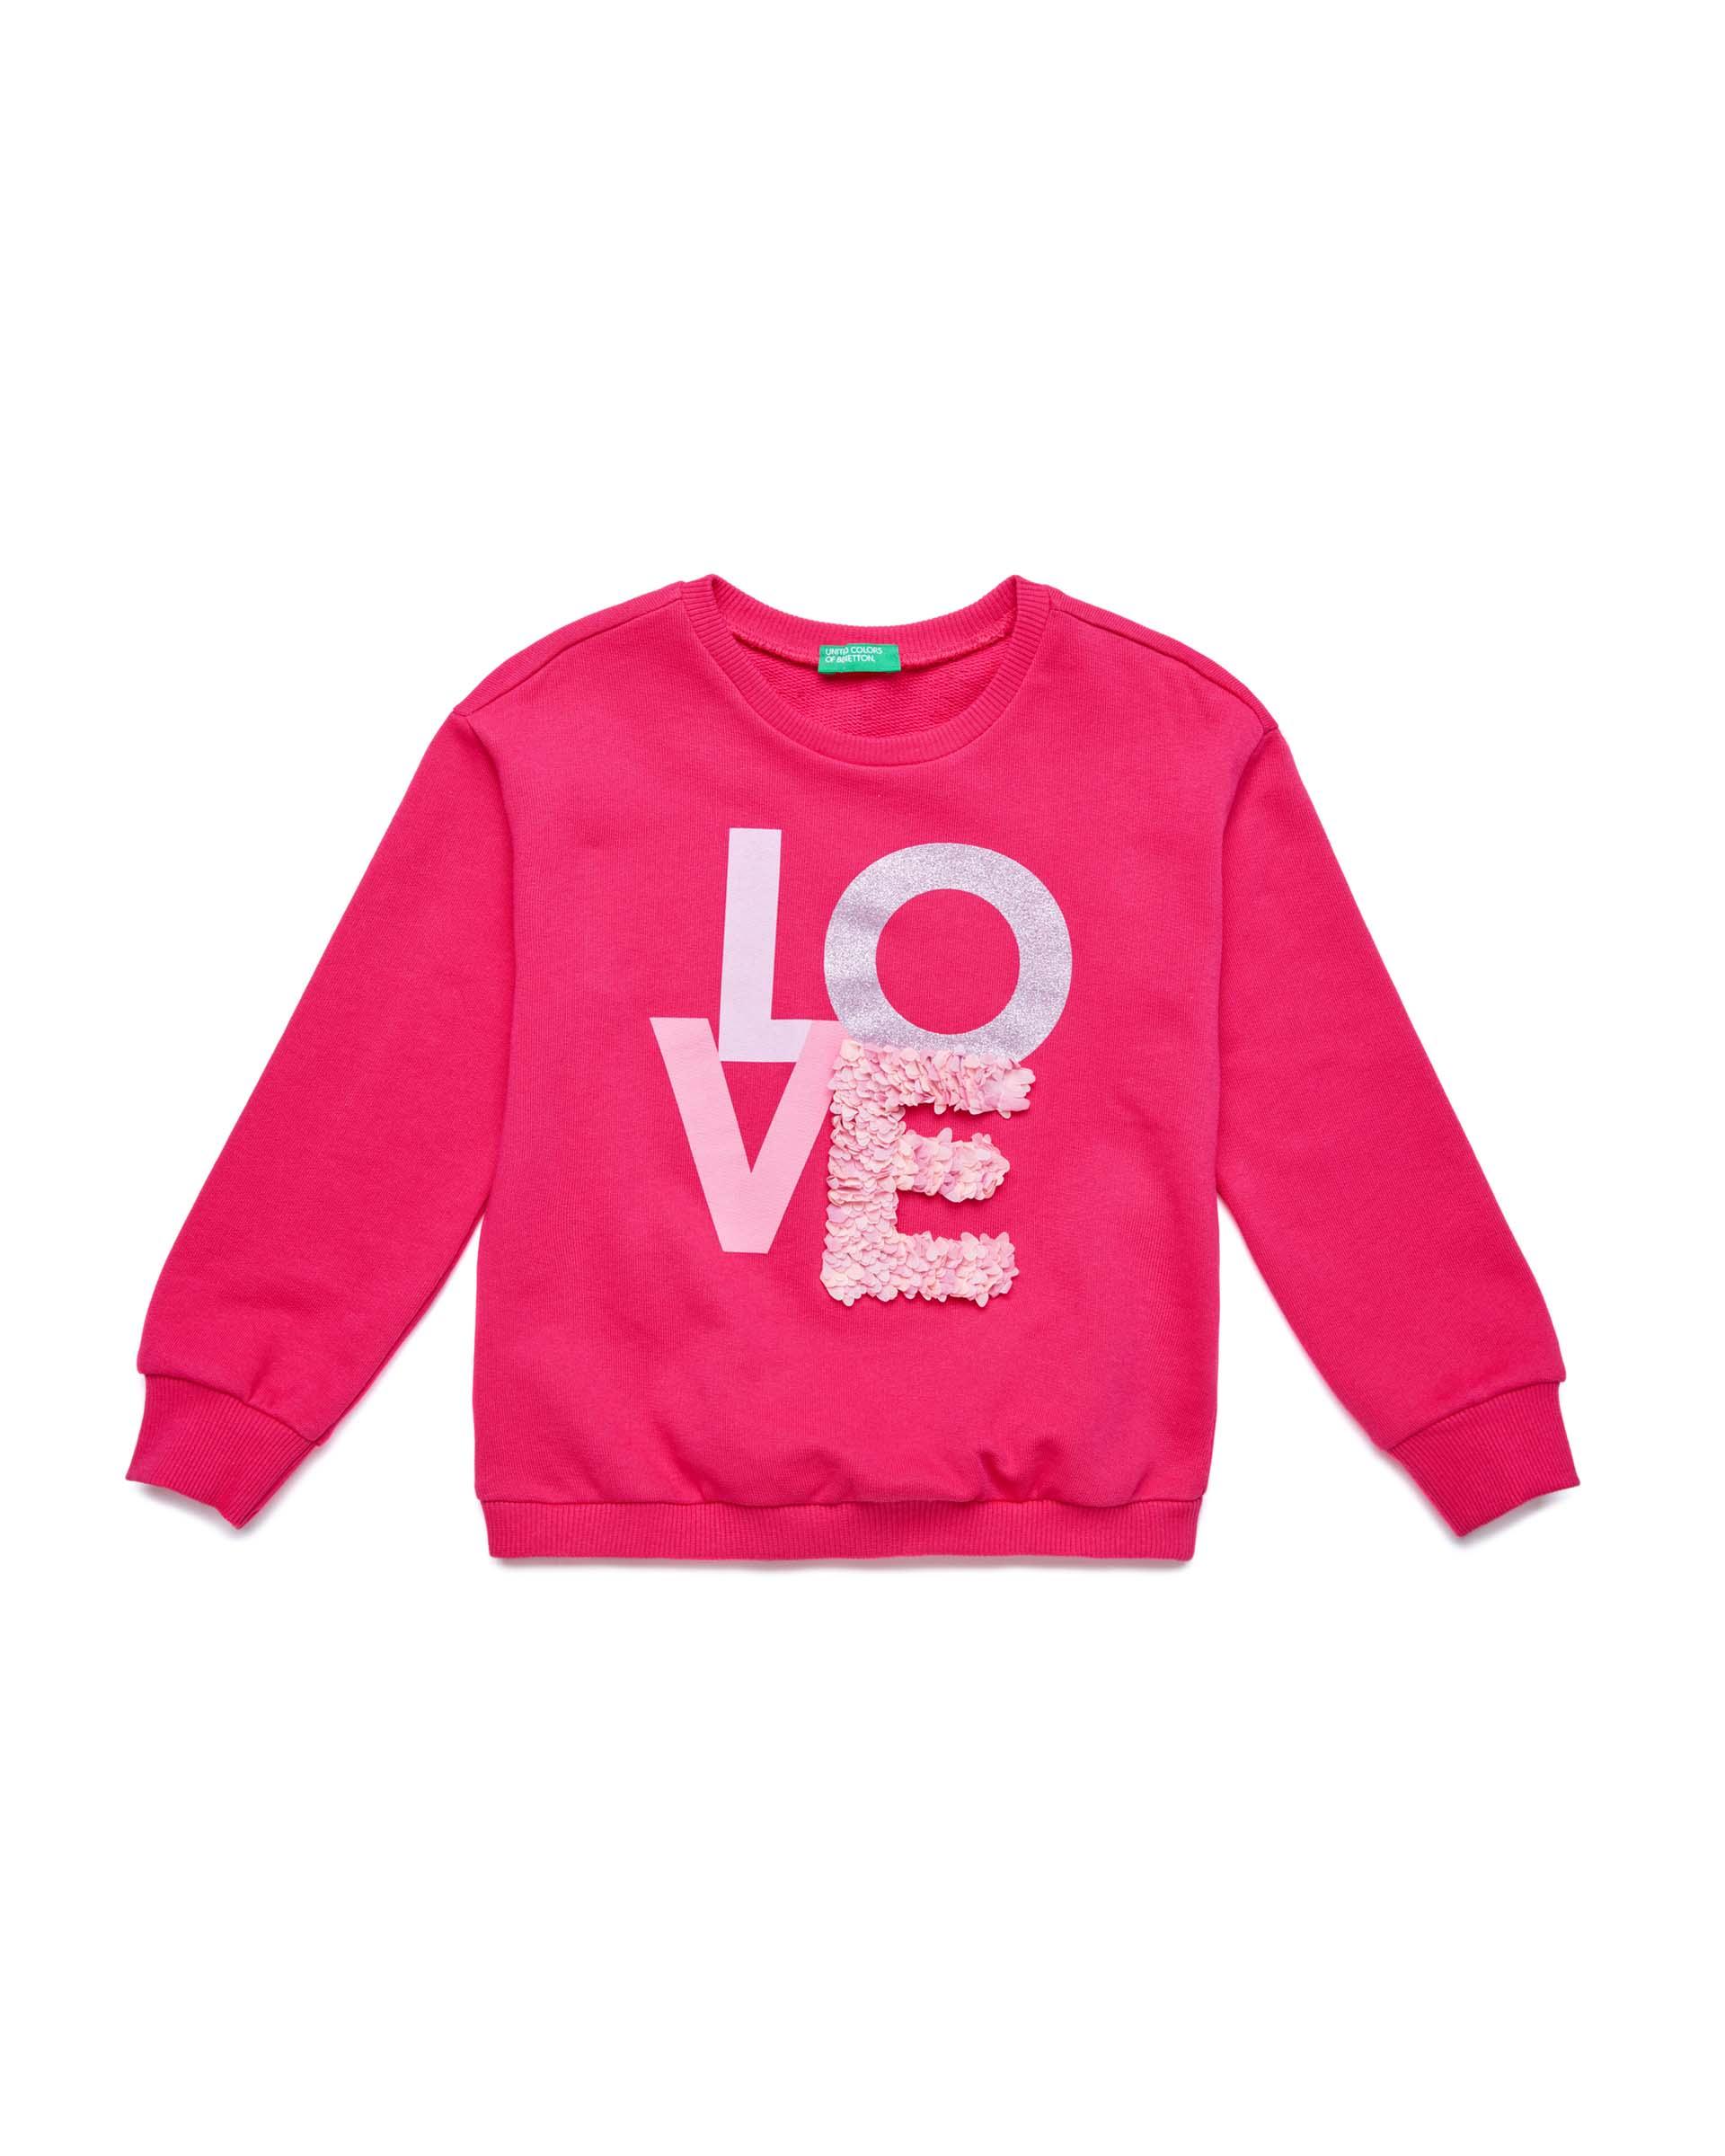 Купить 20P_3J68C14L2_2L3, Толстовка для девочек Benetton 3J68C14L2_2L3 р-р 152, United Colors of Benetton, Толстовки для девочек